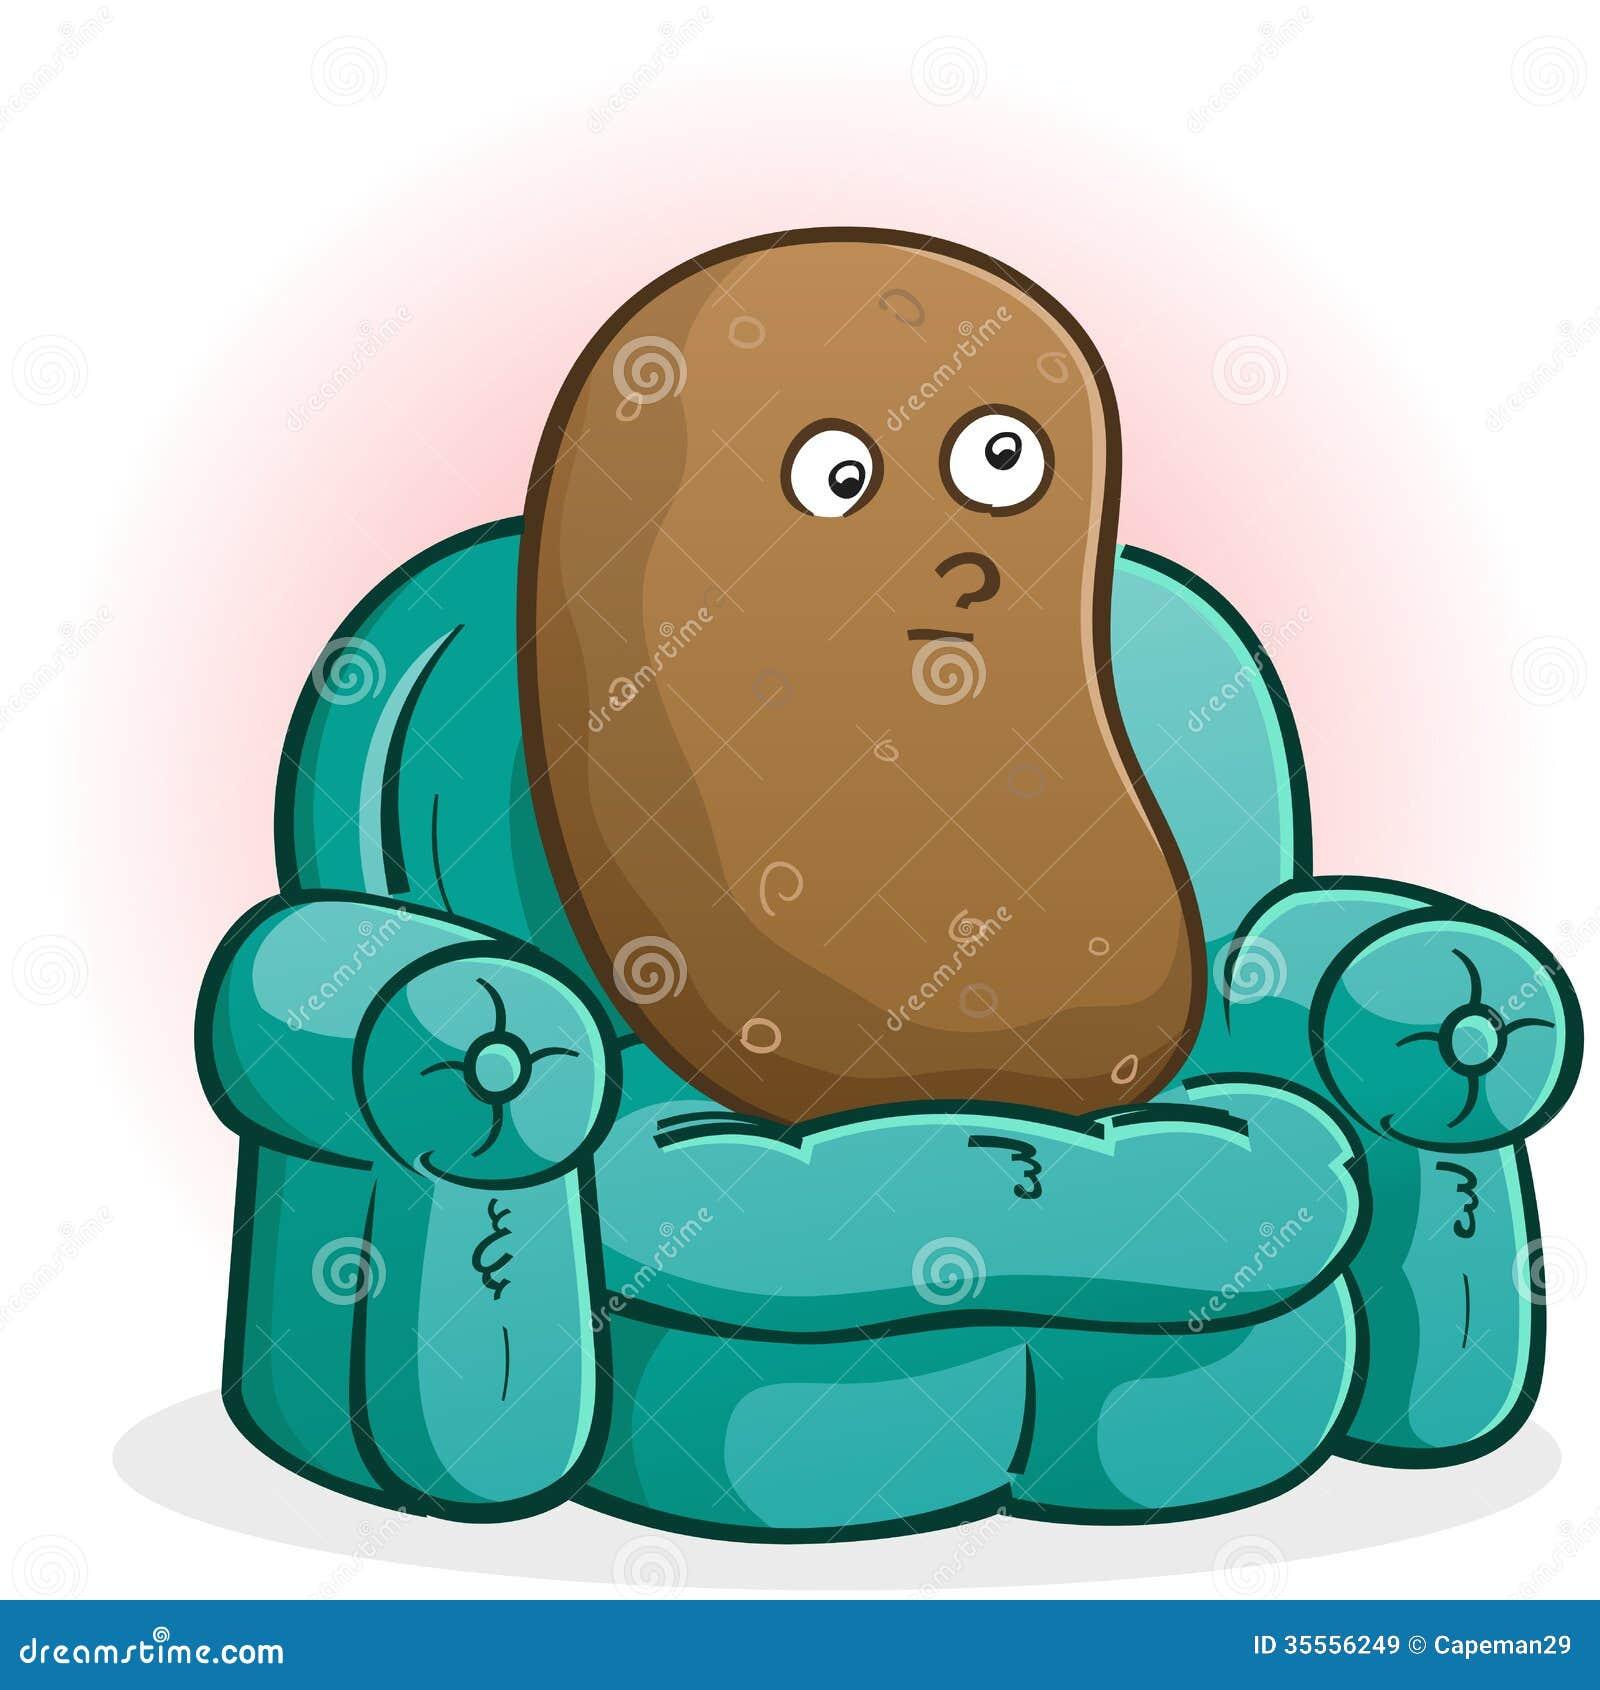 Couch Potato Cartoon Character Stock Vector Image 35556249